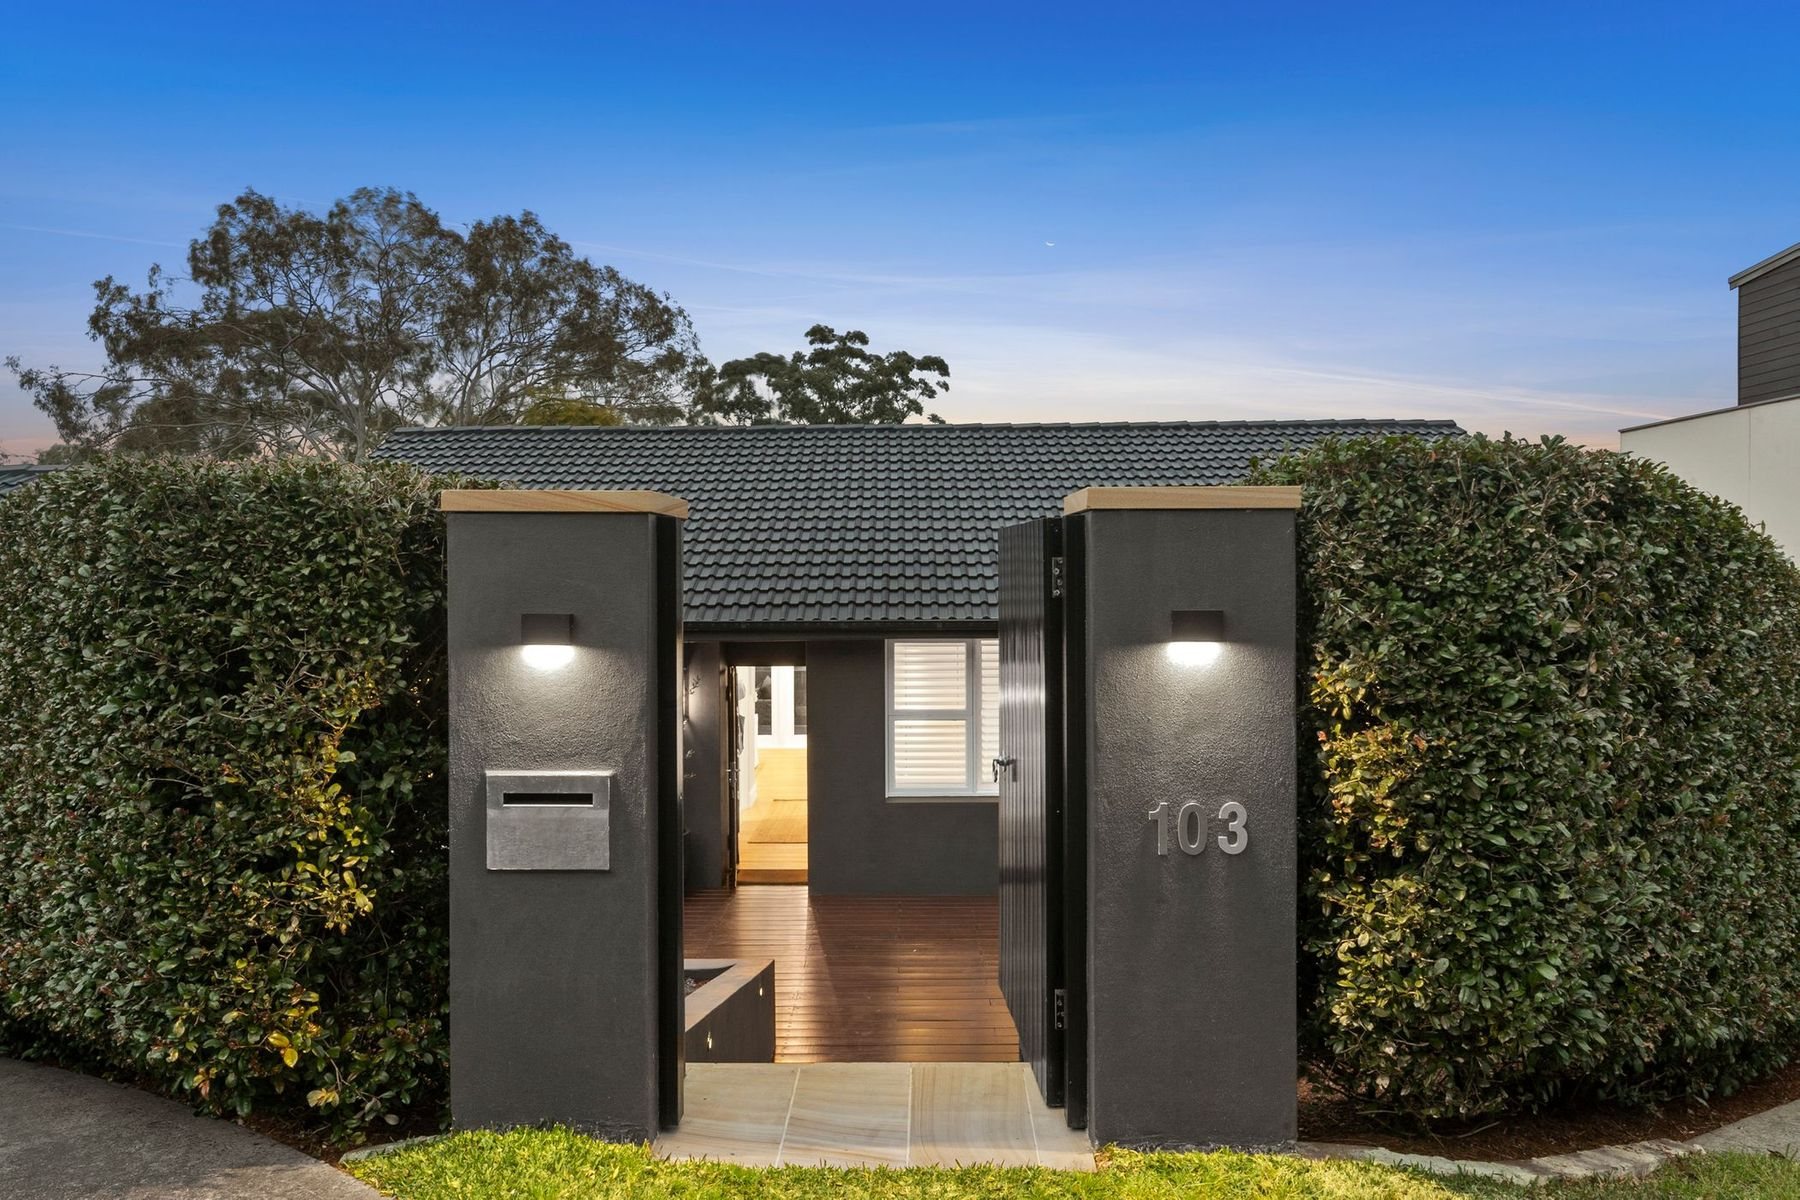 103 Arthur Street, Forestville, NSW 2087